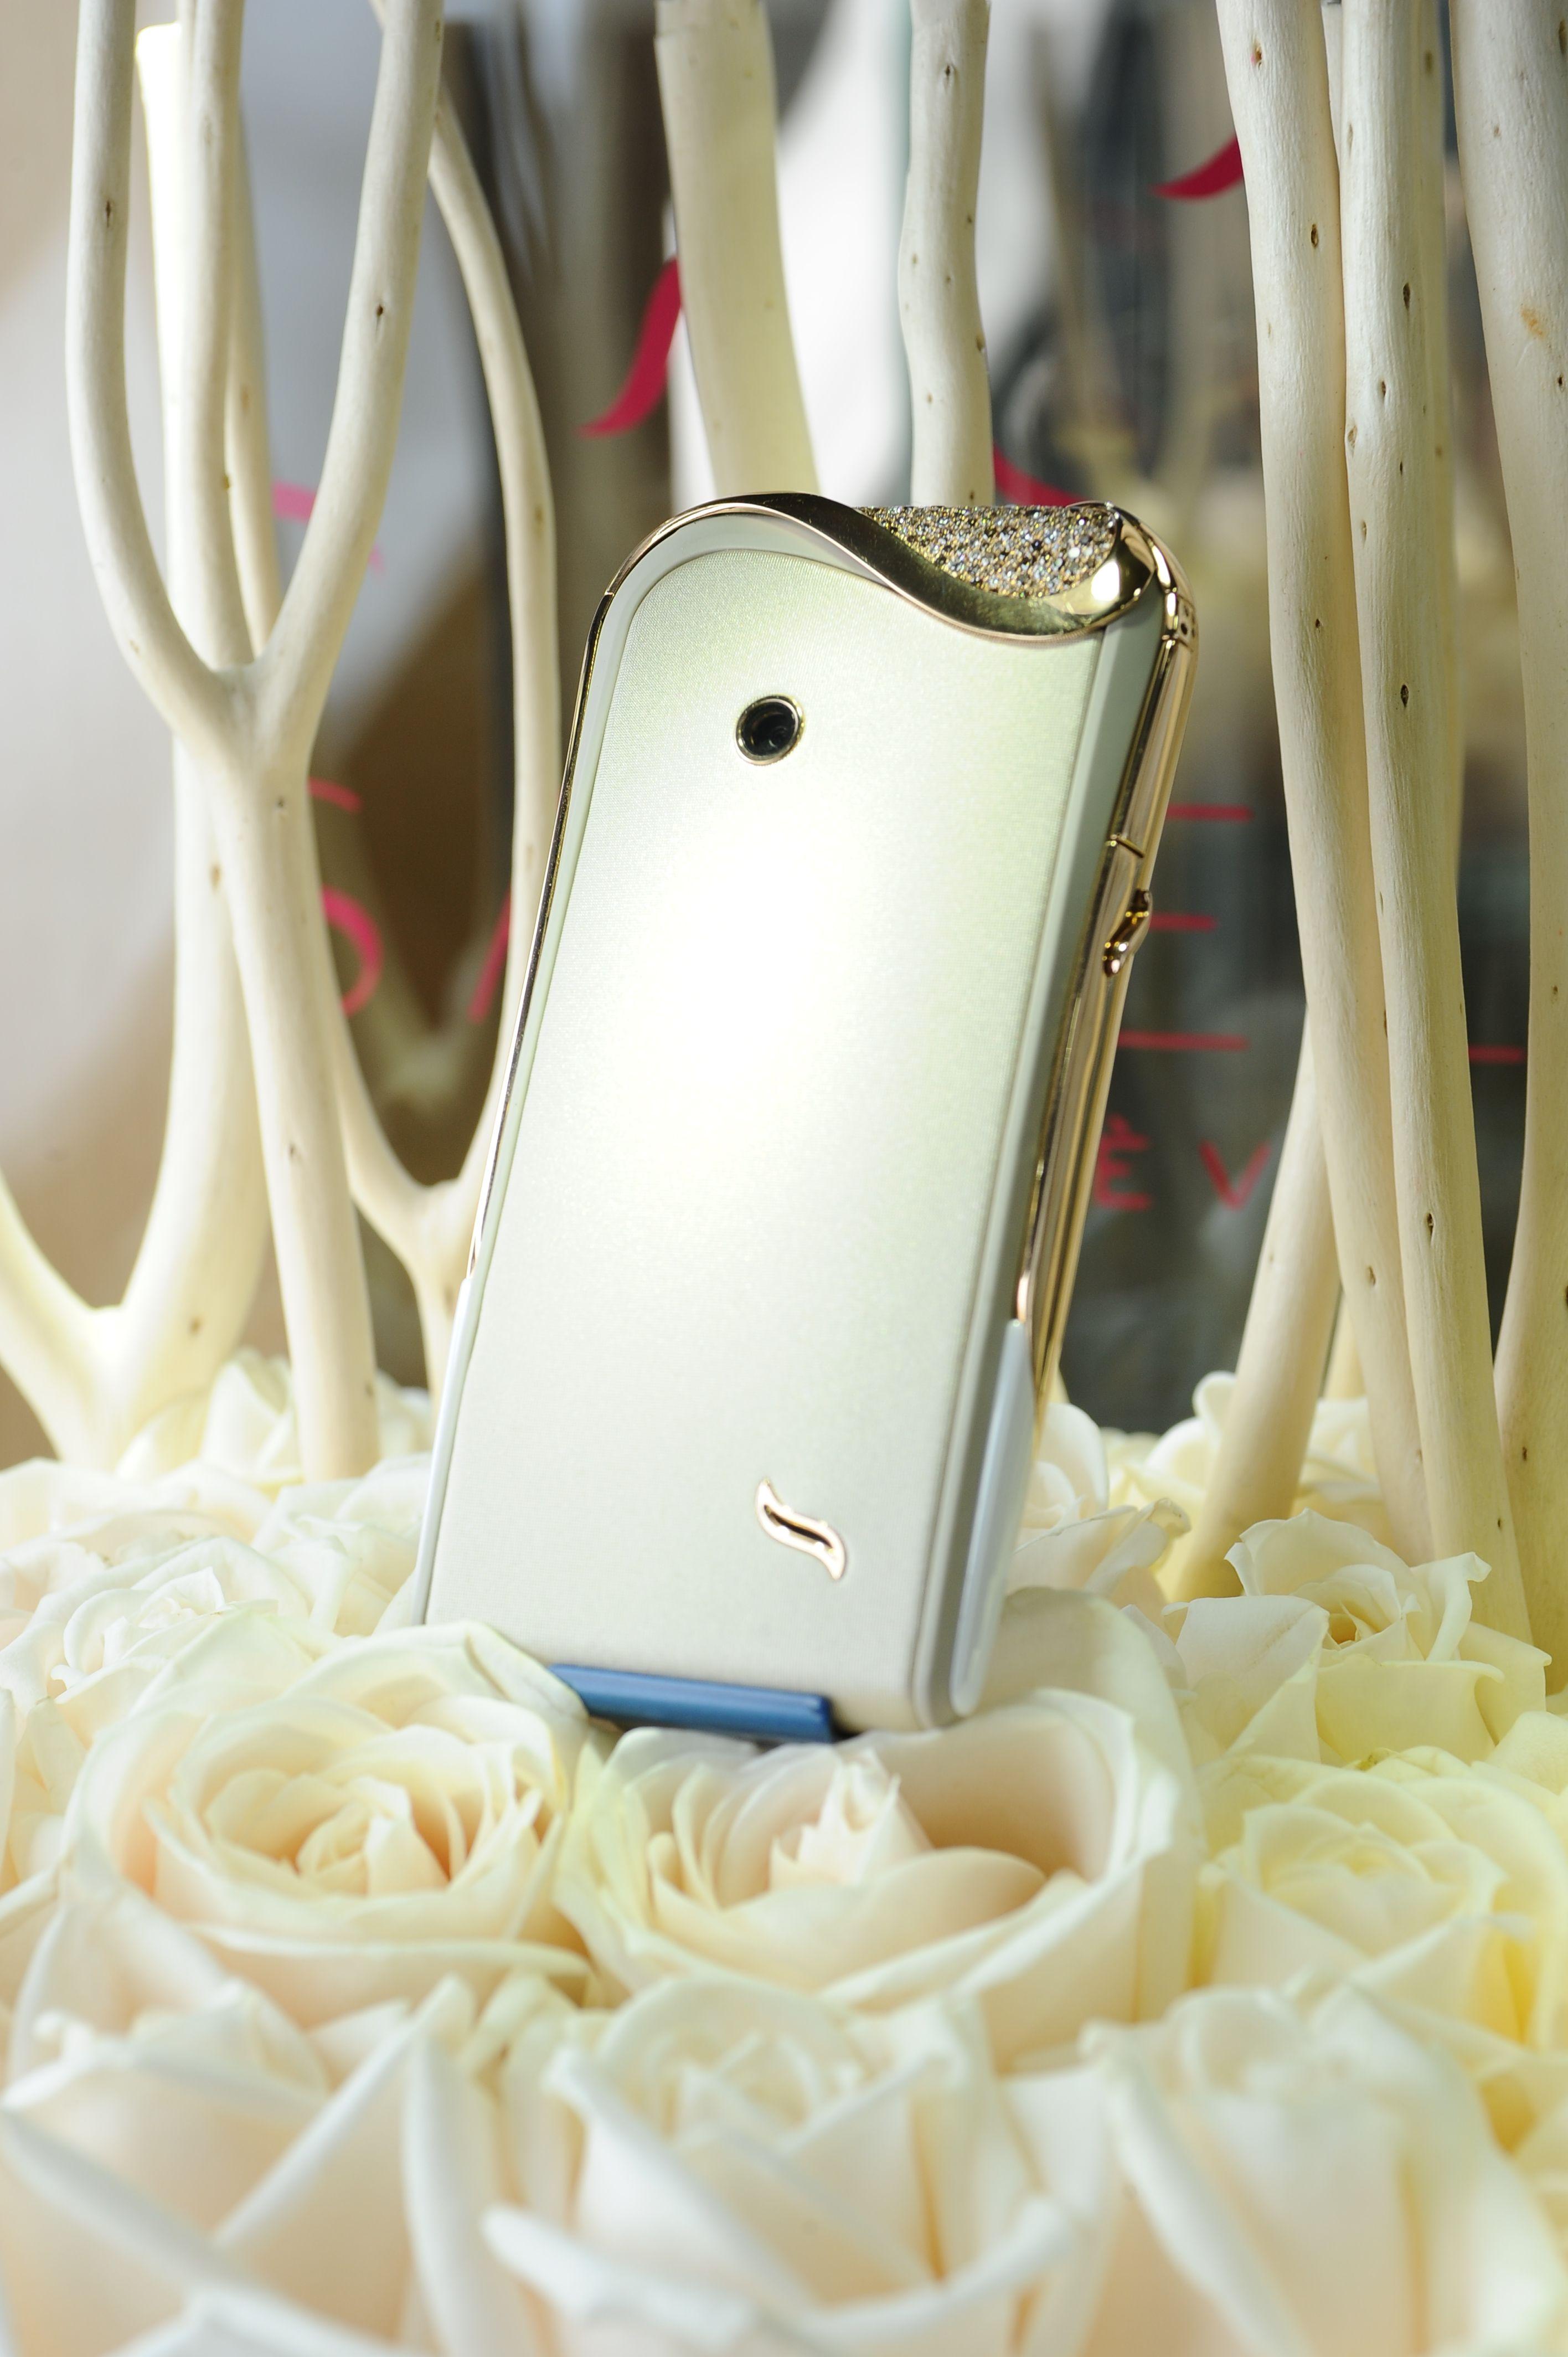 Savelli Jardin Secret collection of luxury smartphones specially